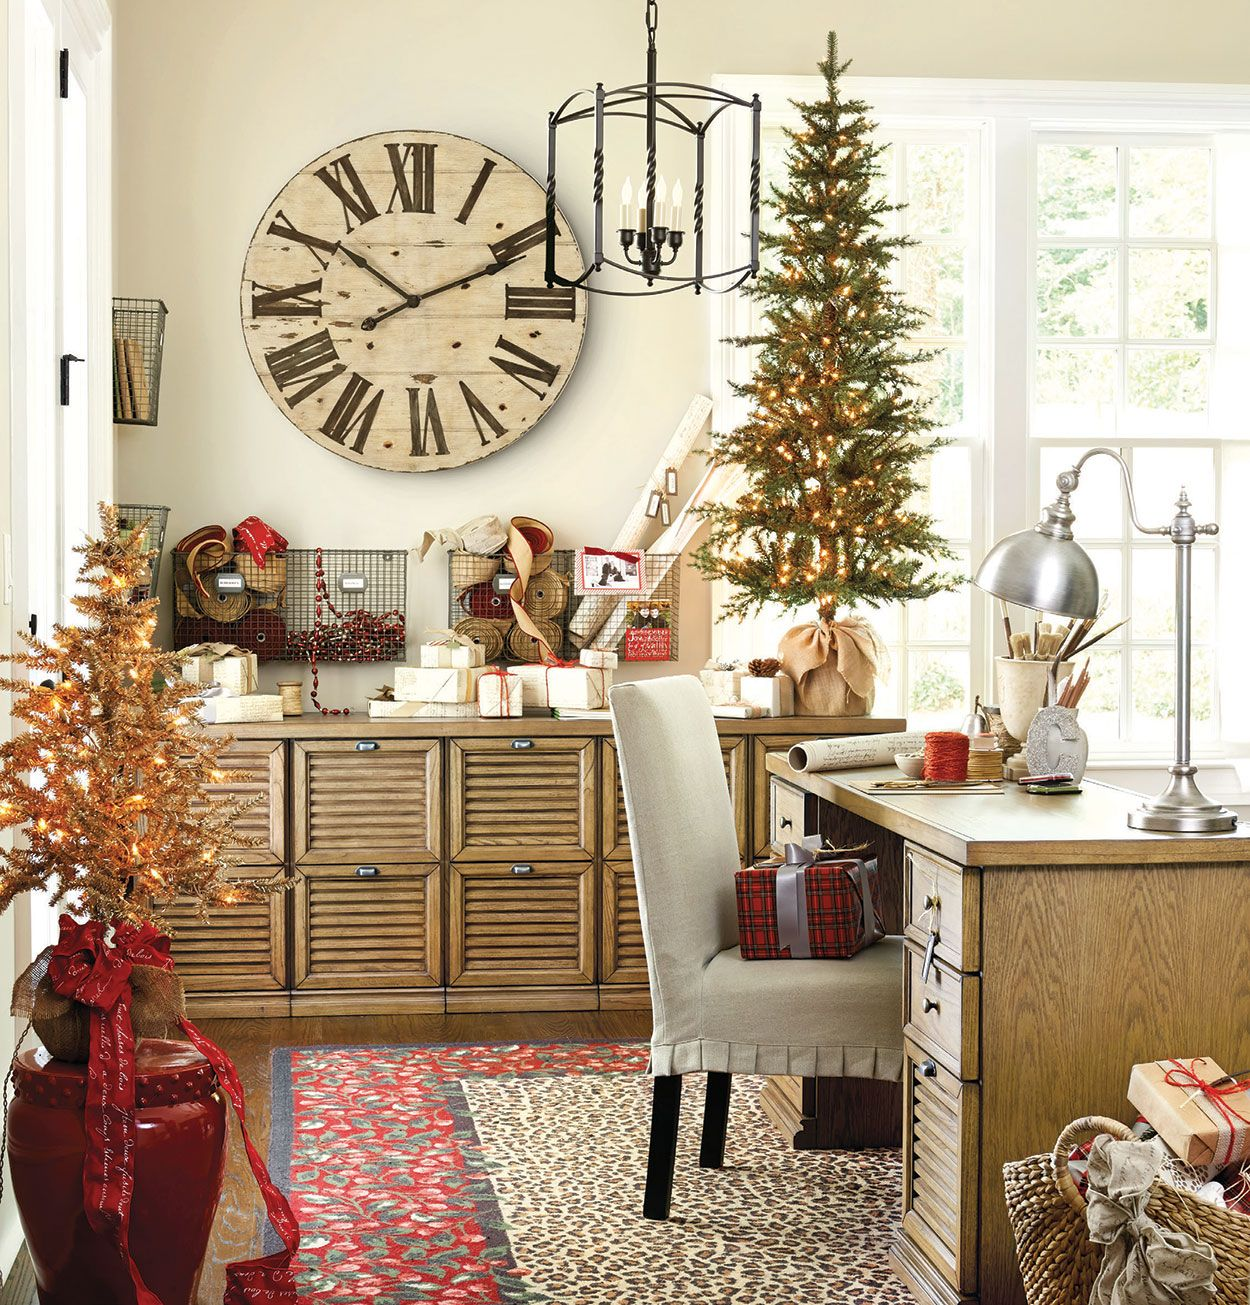 Decoration Inspiration: Click For More Holiday Decor Inspiration